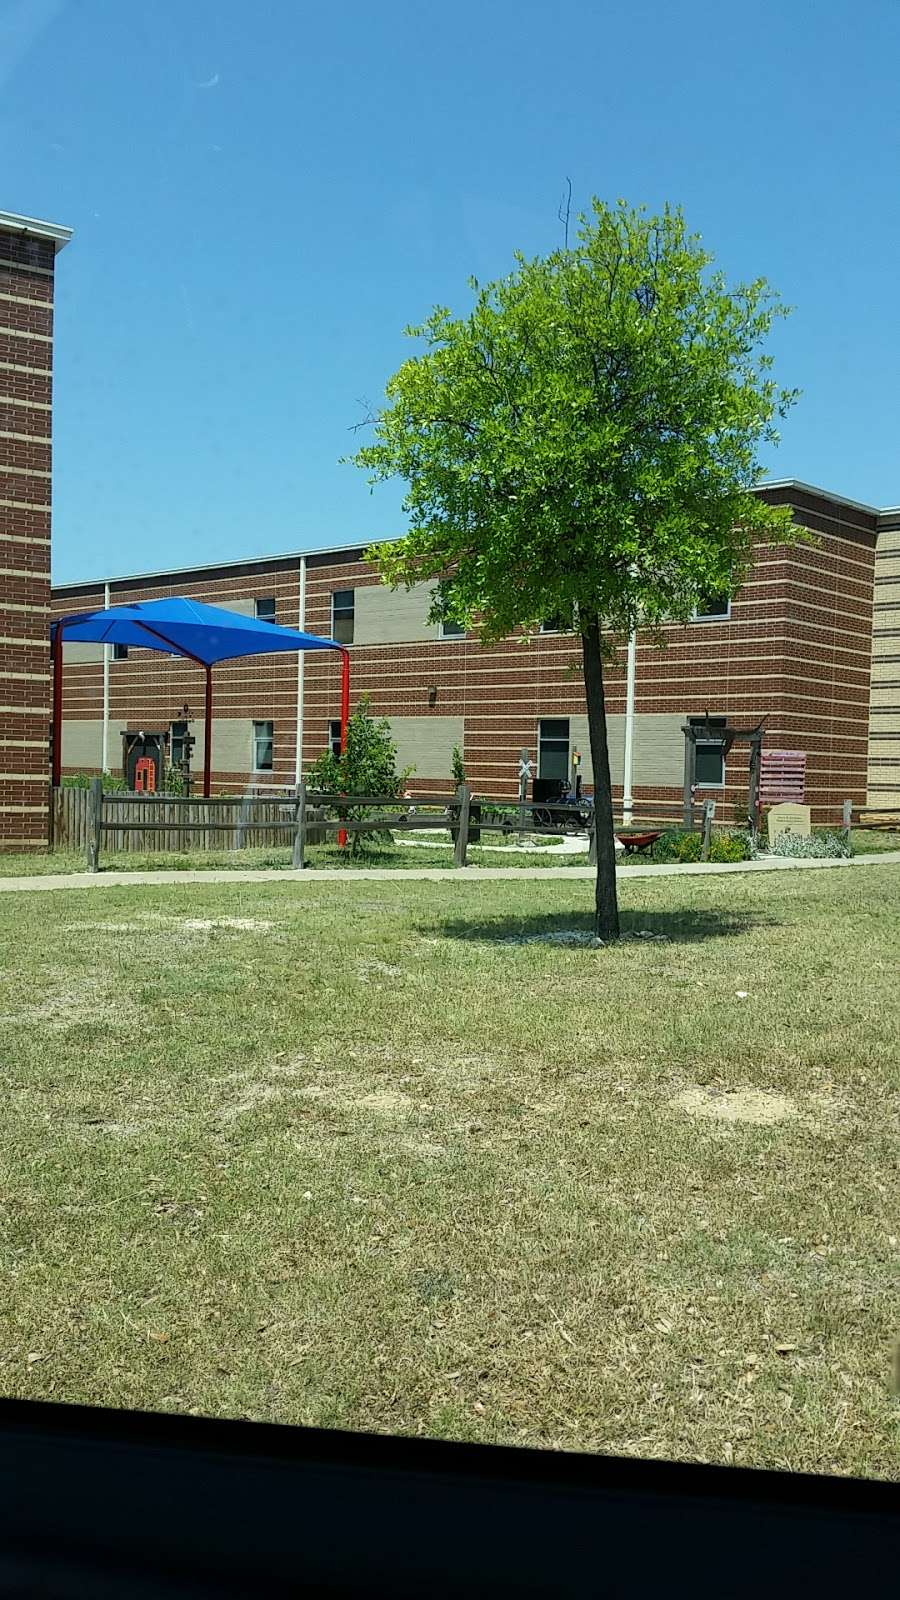 Jerry R. Junkins Elementary School - school  | Photo 2 of 2 | Address: 2808 Running Duke Dr, Carrollton, TX 75006, USA | Phone: (972) 502-2400